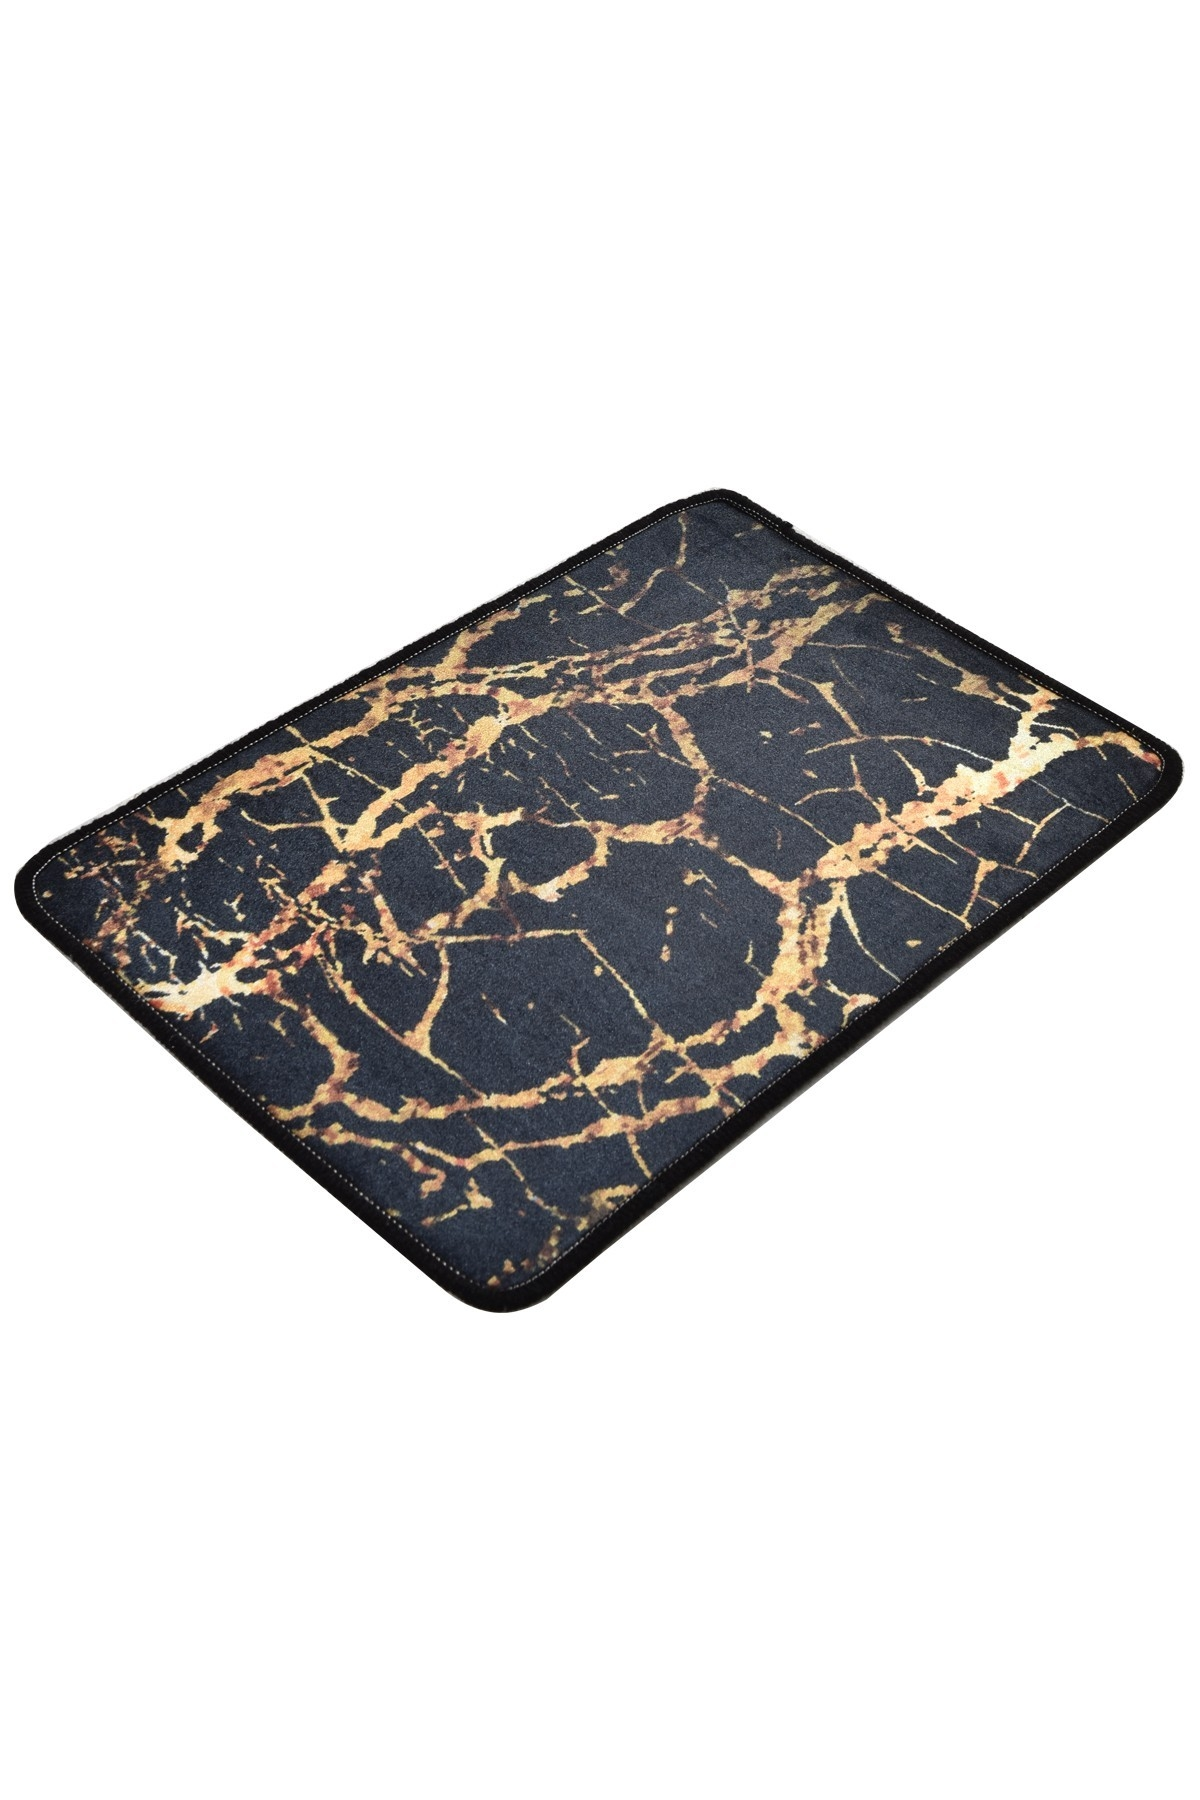 Covoras pentru baie Goldes Auriu / Negru, 40 x 60 cm poza